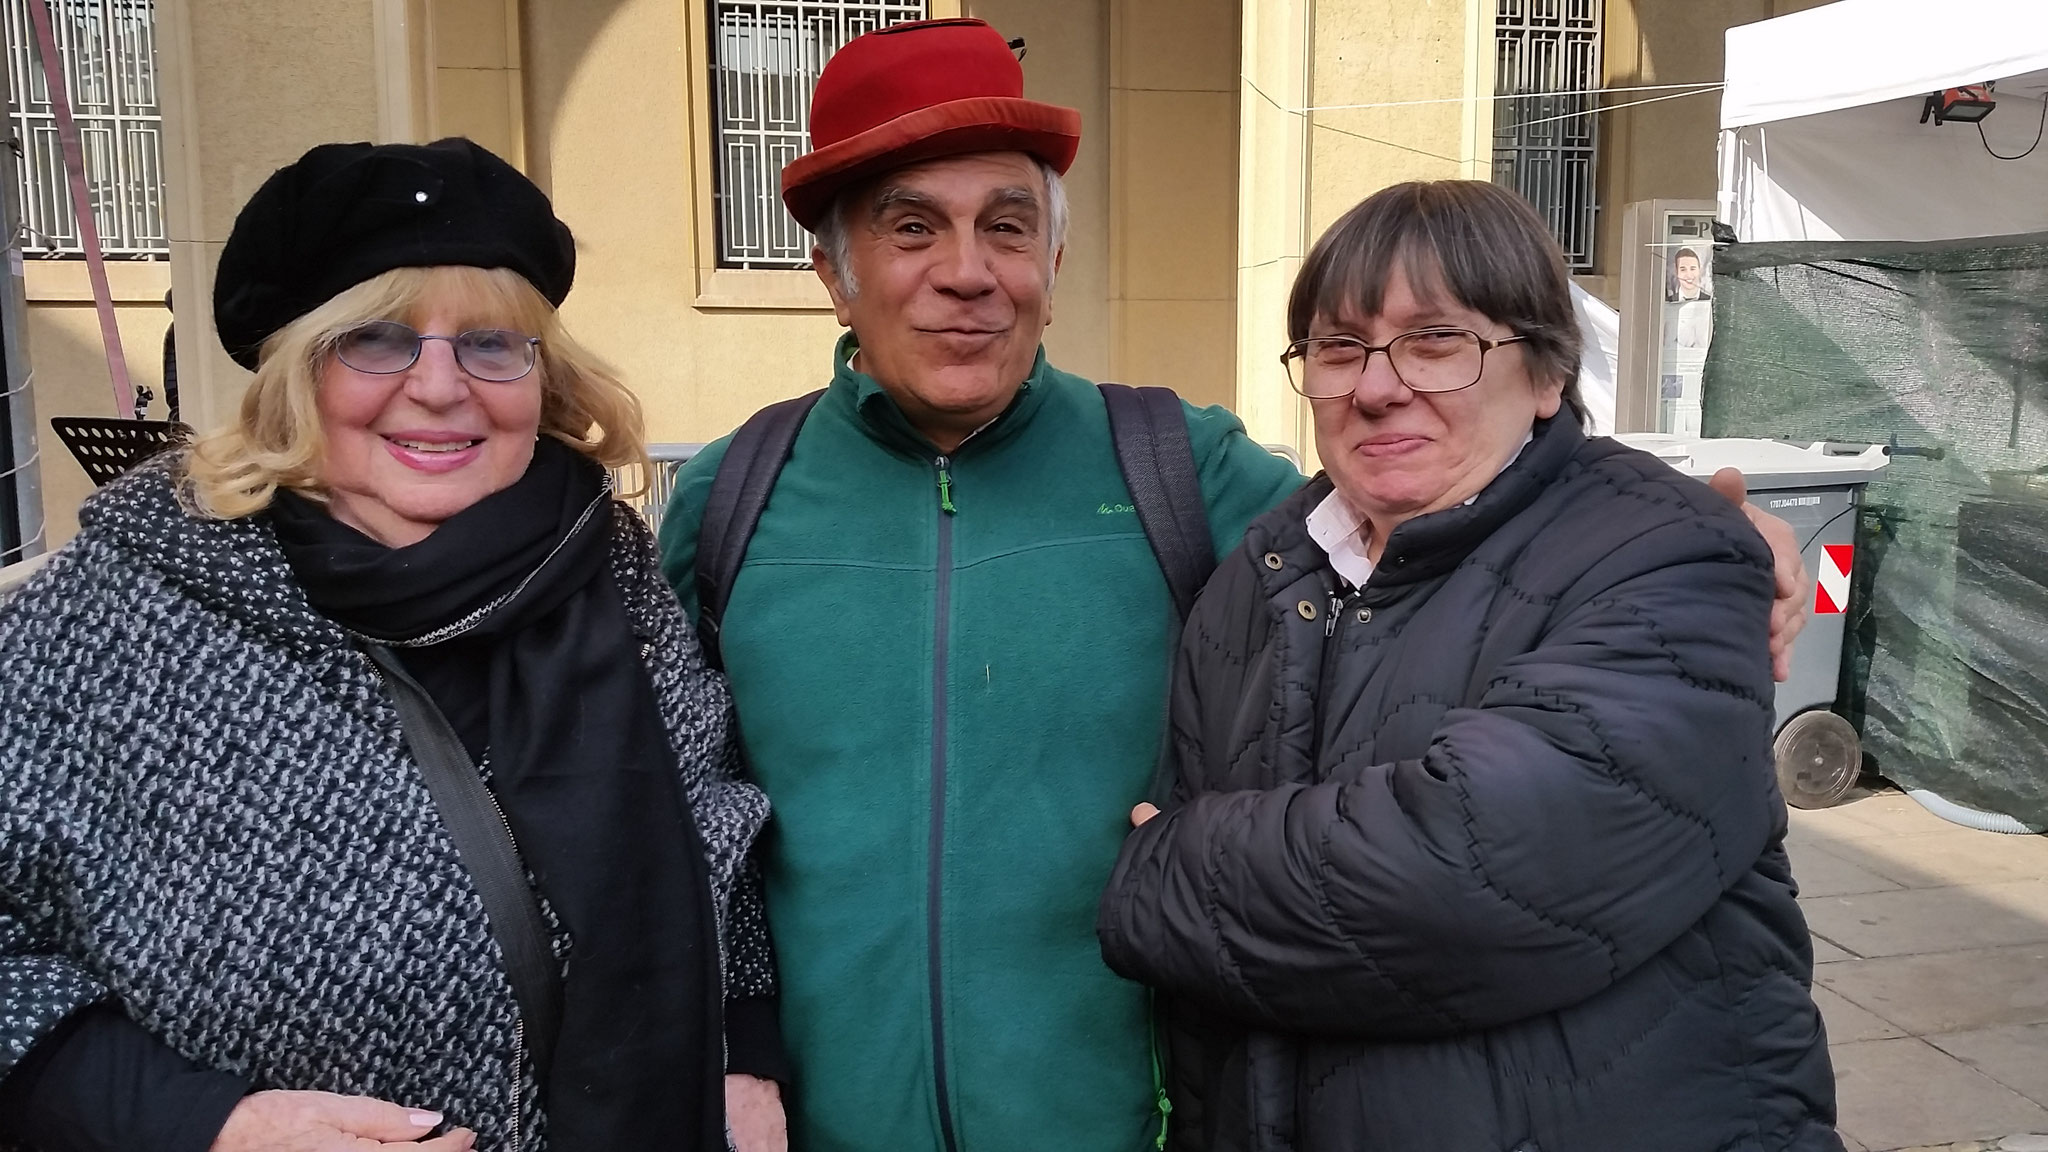 DEDI DE ANTIQUIS FELICE PANTONE E SANDRA BONINELLI